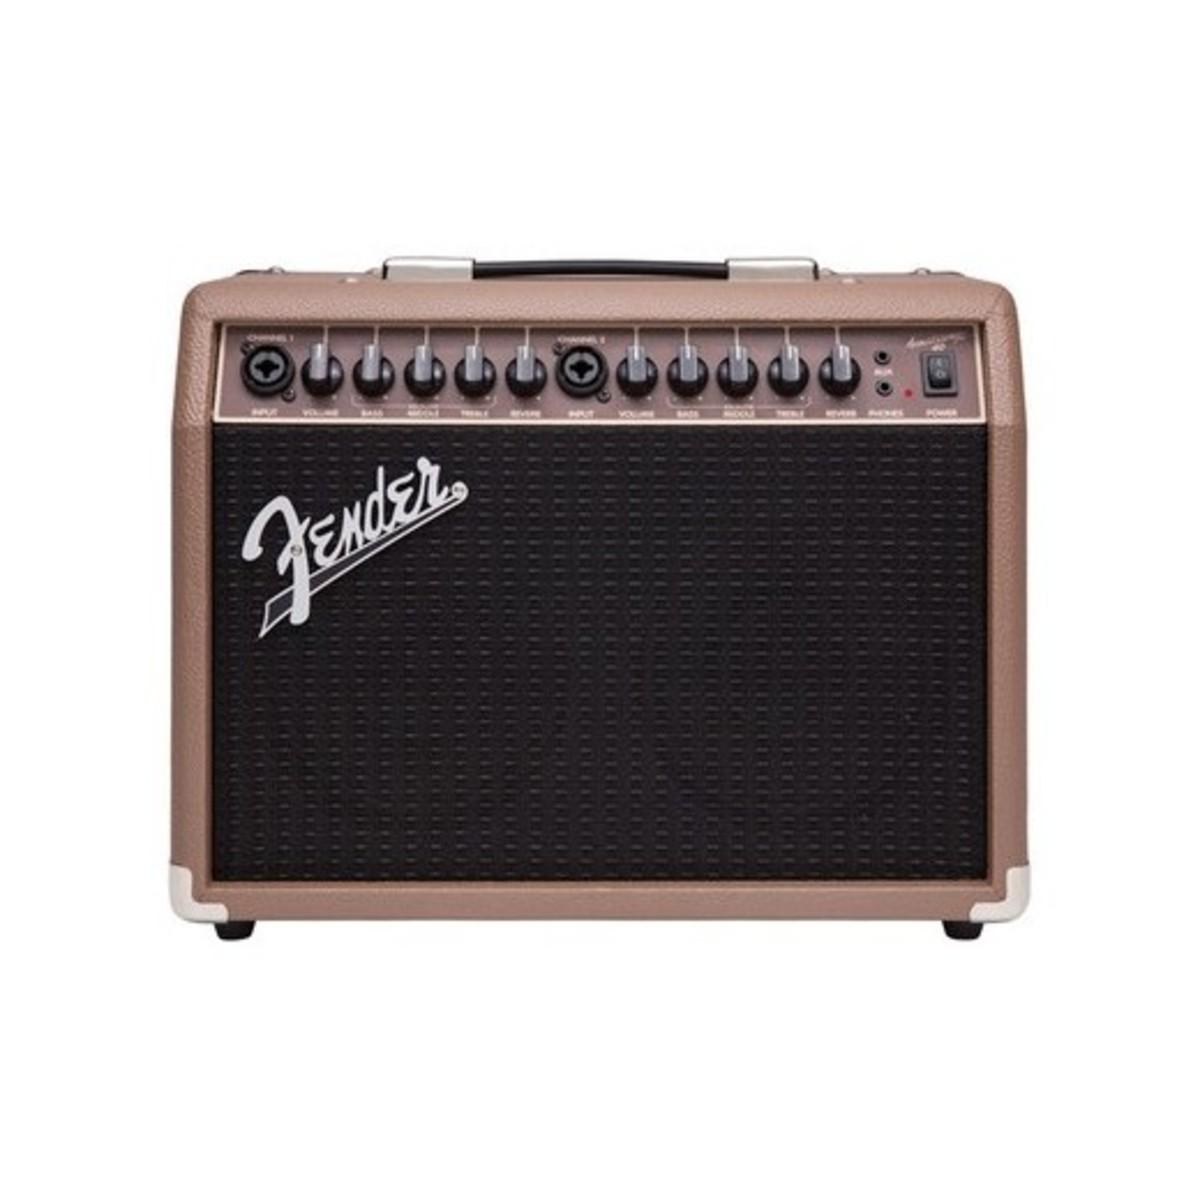 fender acoustasonic 40 acoustic guitar amplifier b stock at gear4music. Black Bedroom Furniture Sets. Home Design Ideas